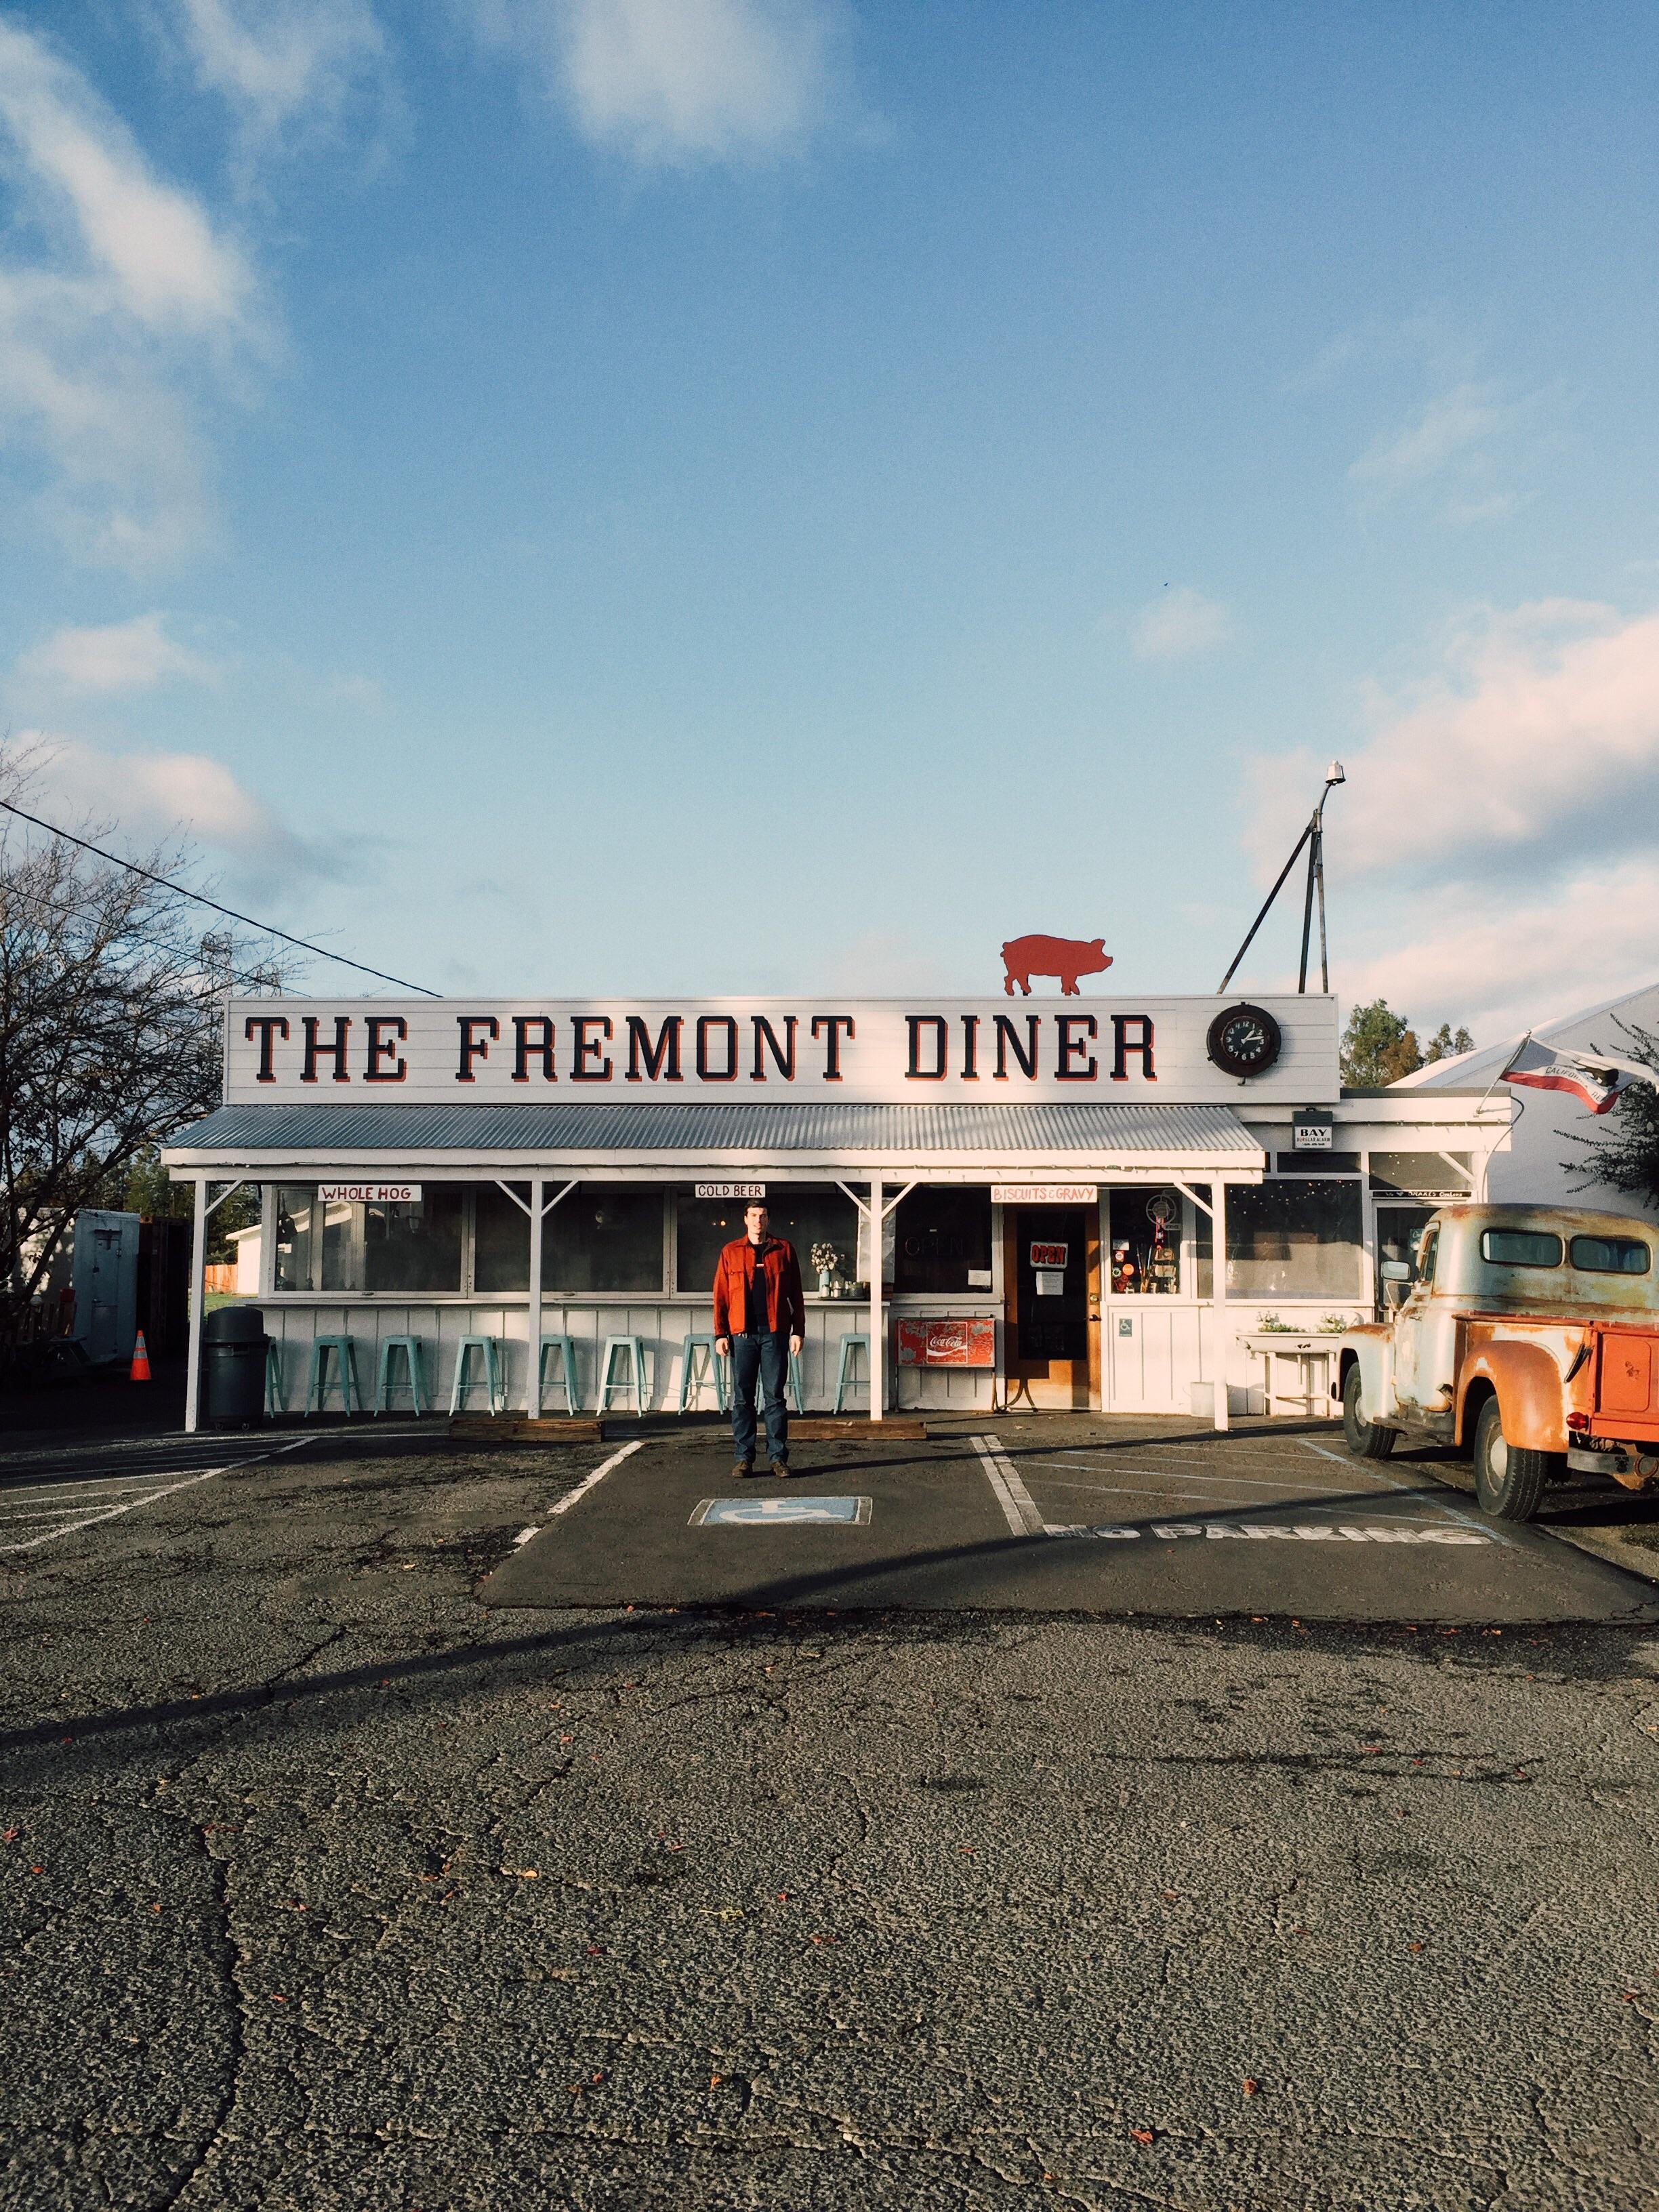 Sonoma, December '15